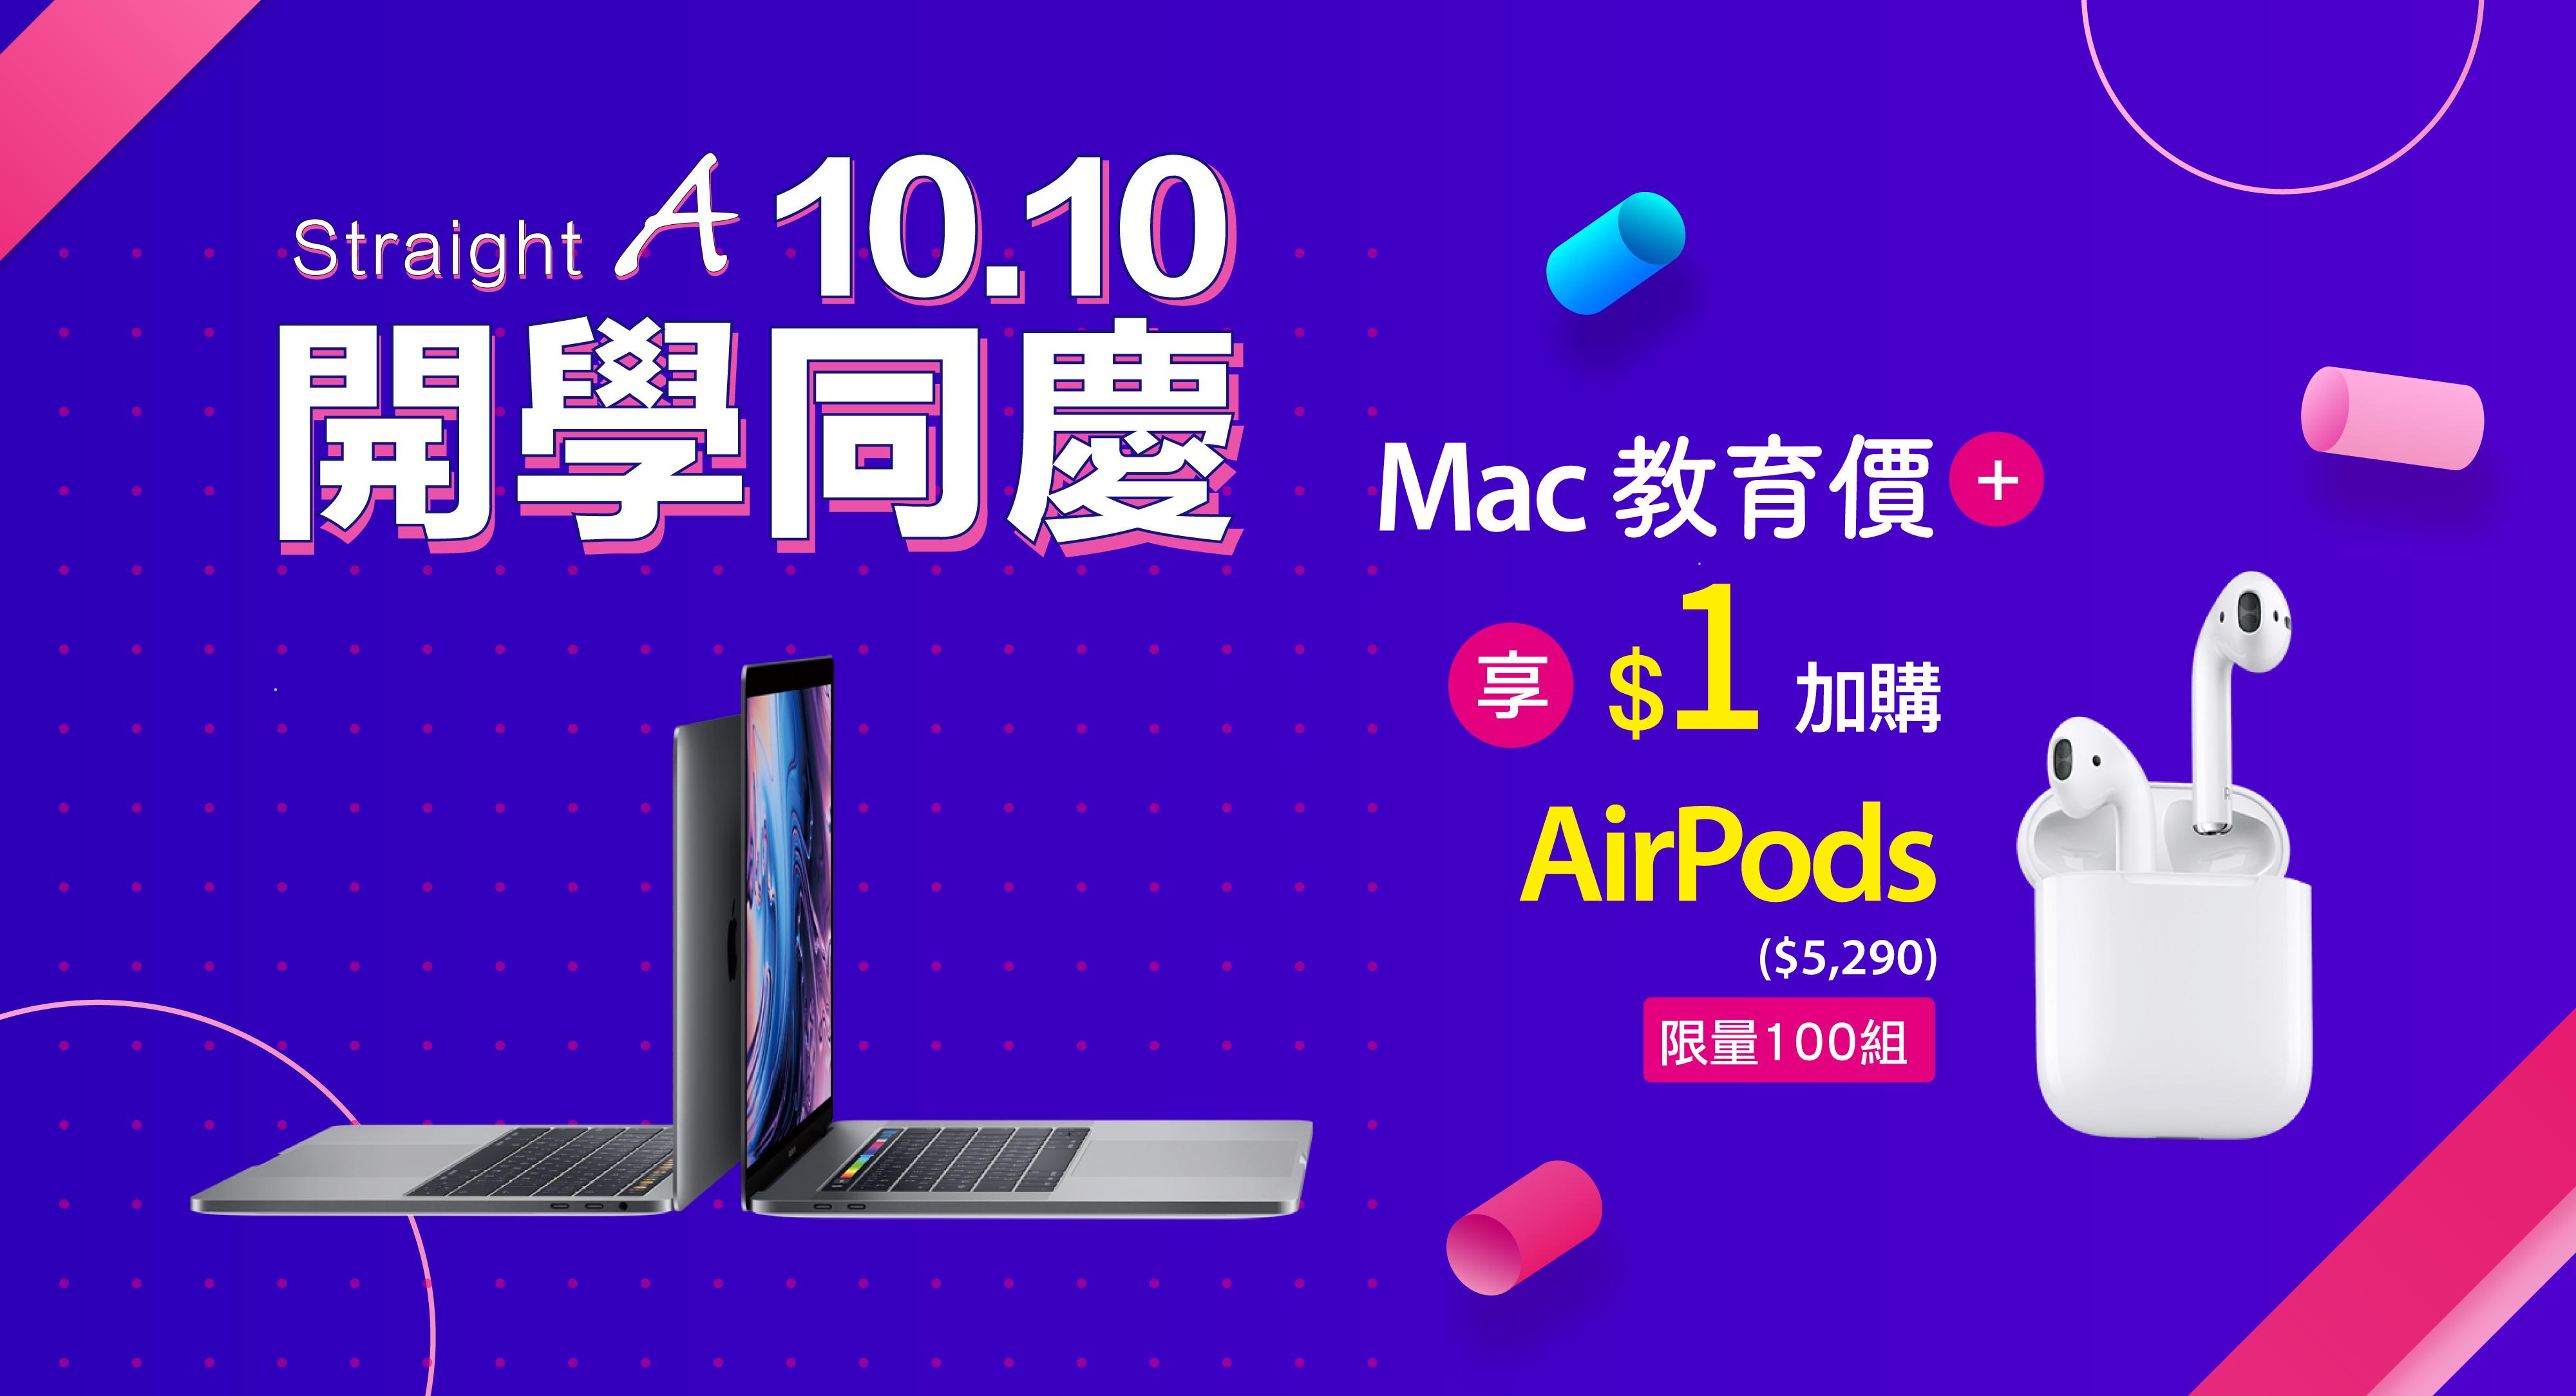 apple, 1元AirPods, Mac, 教育價